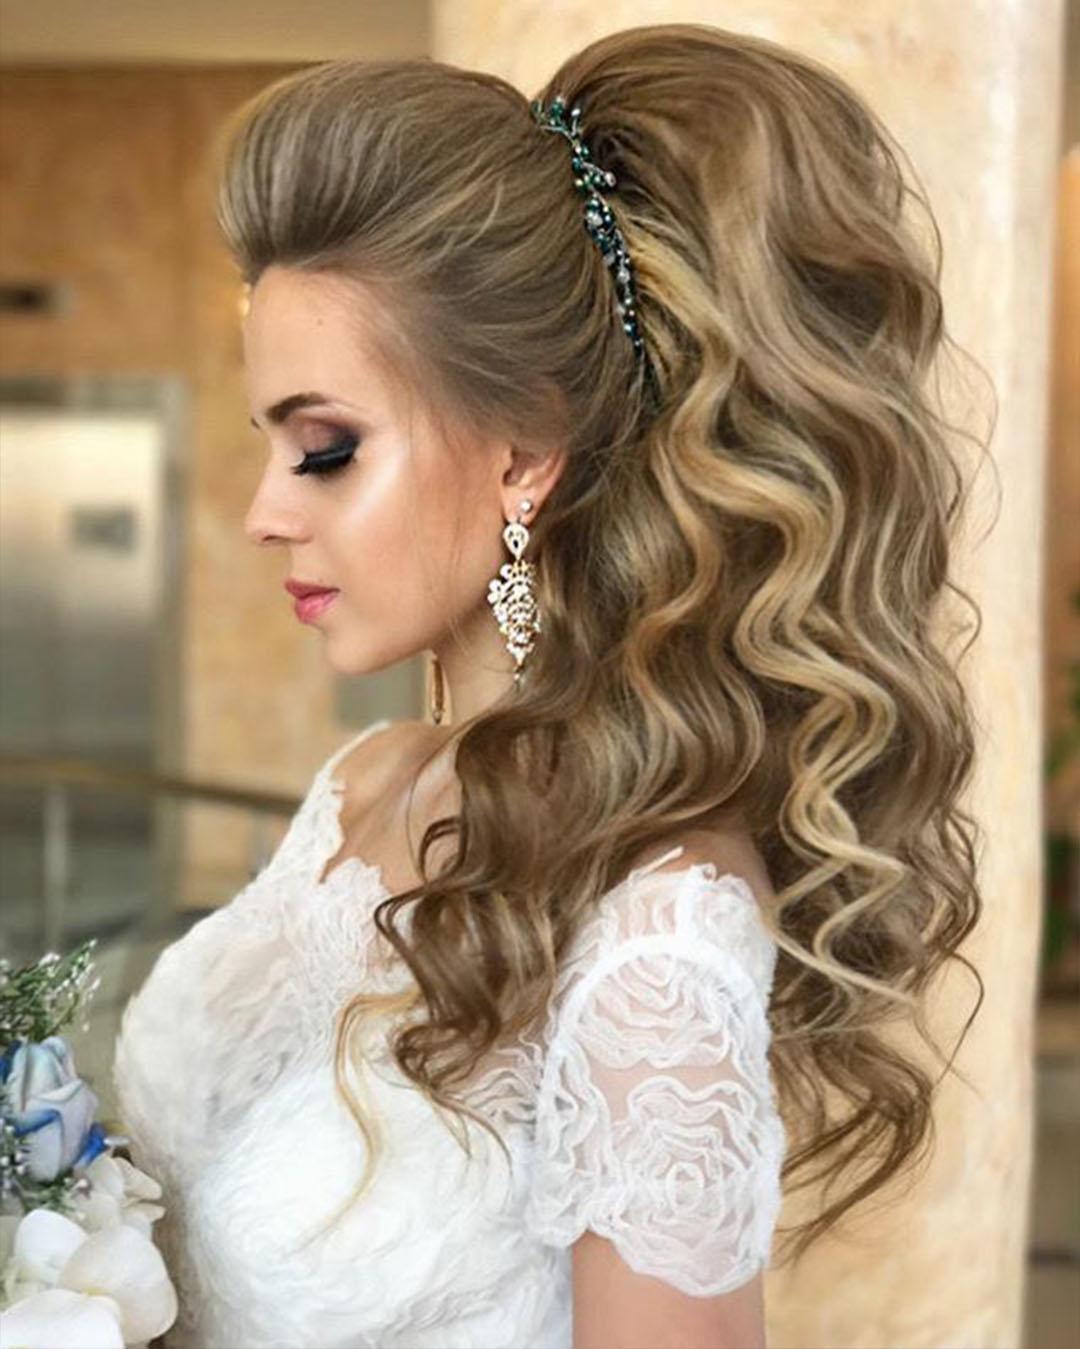 Peinados Para Fiesta De Gala Mujeres Elsexoso